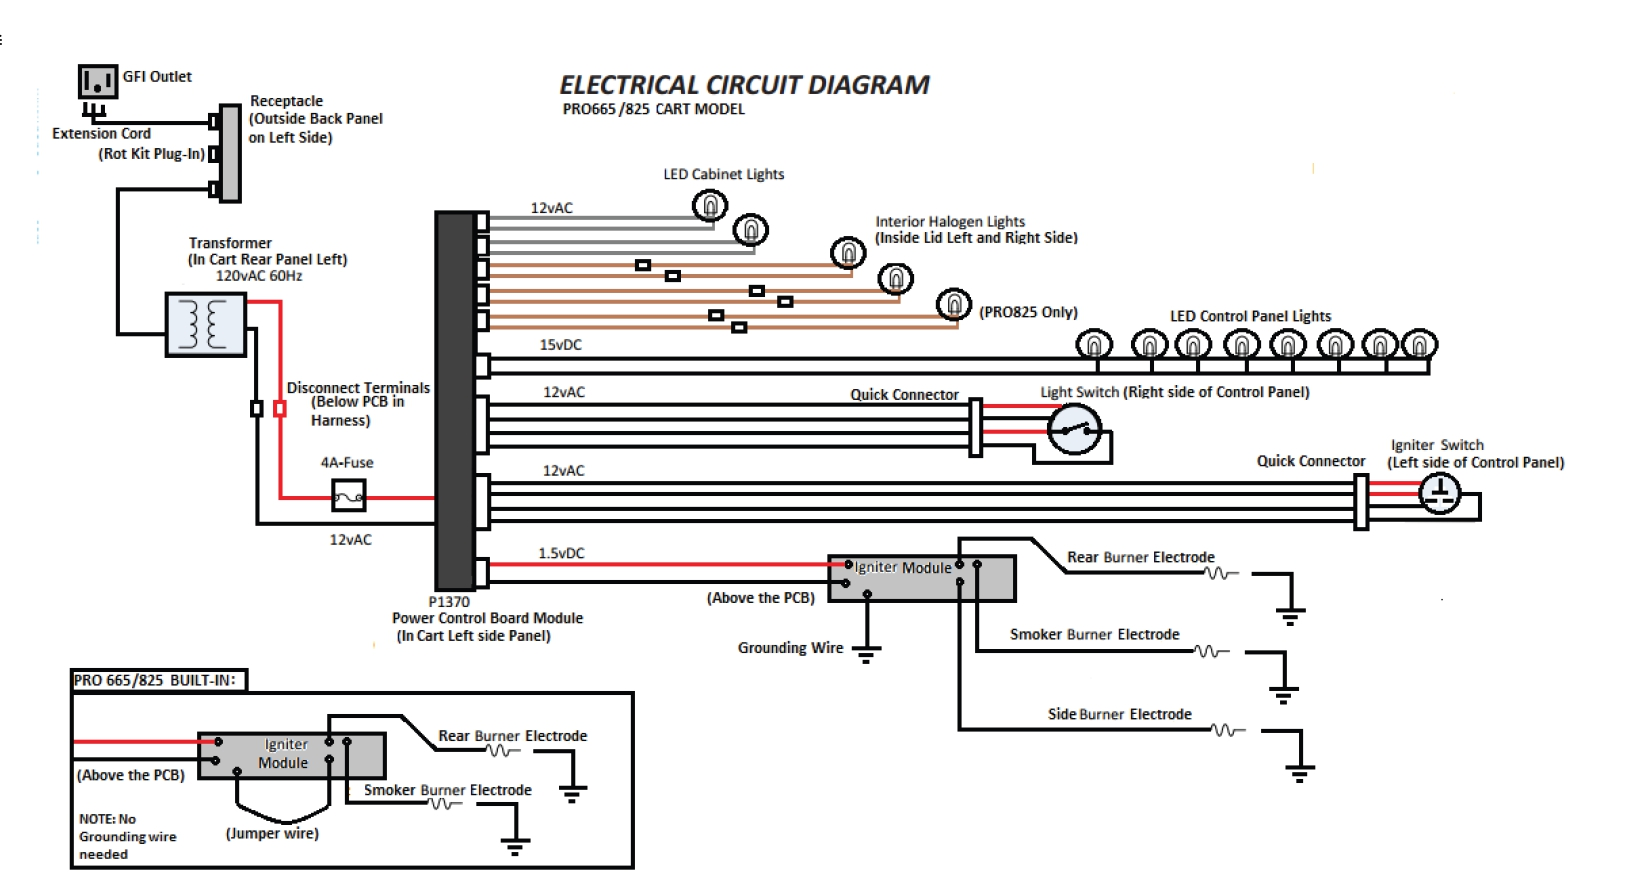 US_Napoleon _BIPRO_825_Model_Electric.jpg